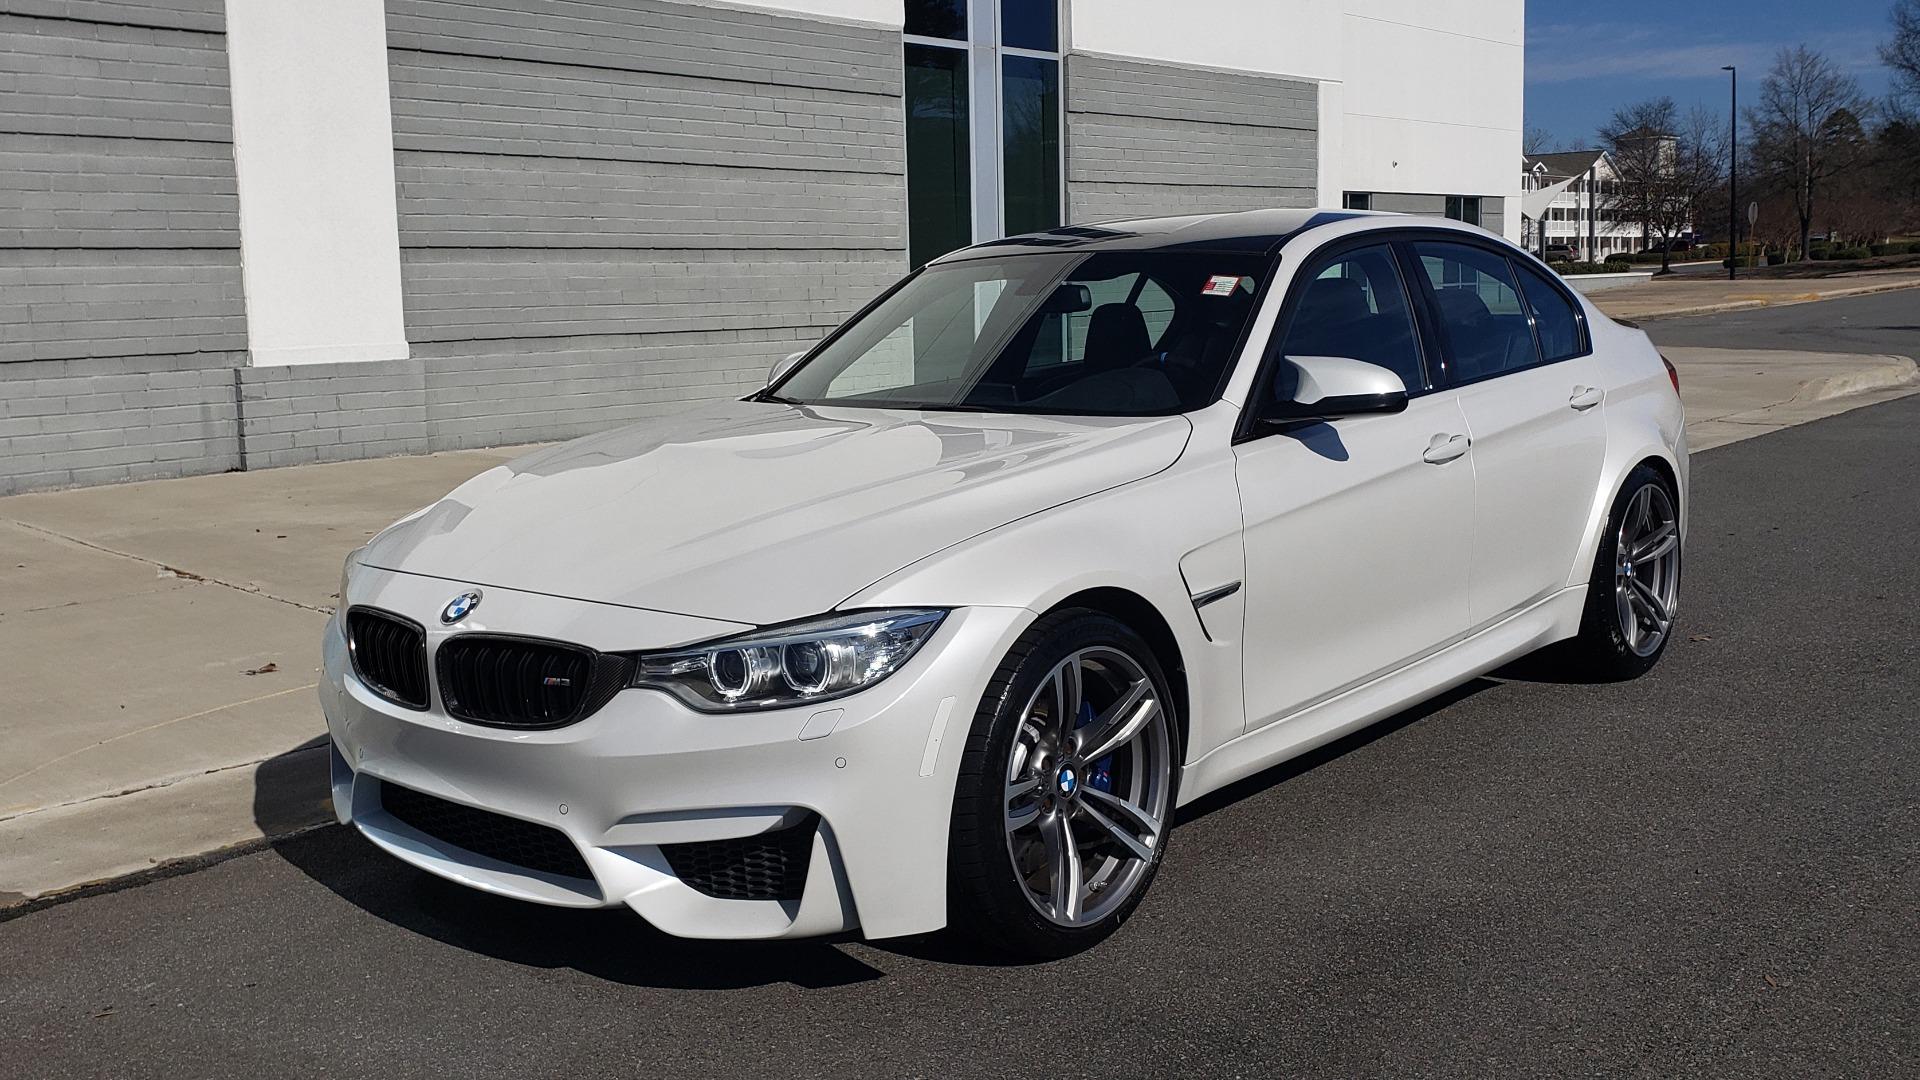 Used 2016 BMW M3 SEDAN / EXECUTIVE PKG / M-SUSPENSION / HARMAN/KARDON SOUND for sale Sold at Formula Imports in Charlotte NC 28227 4